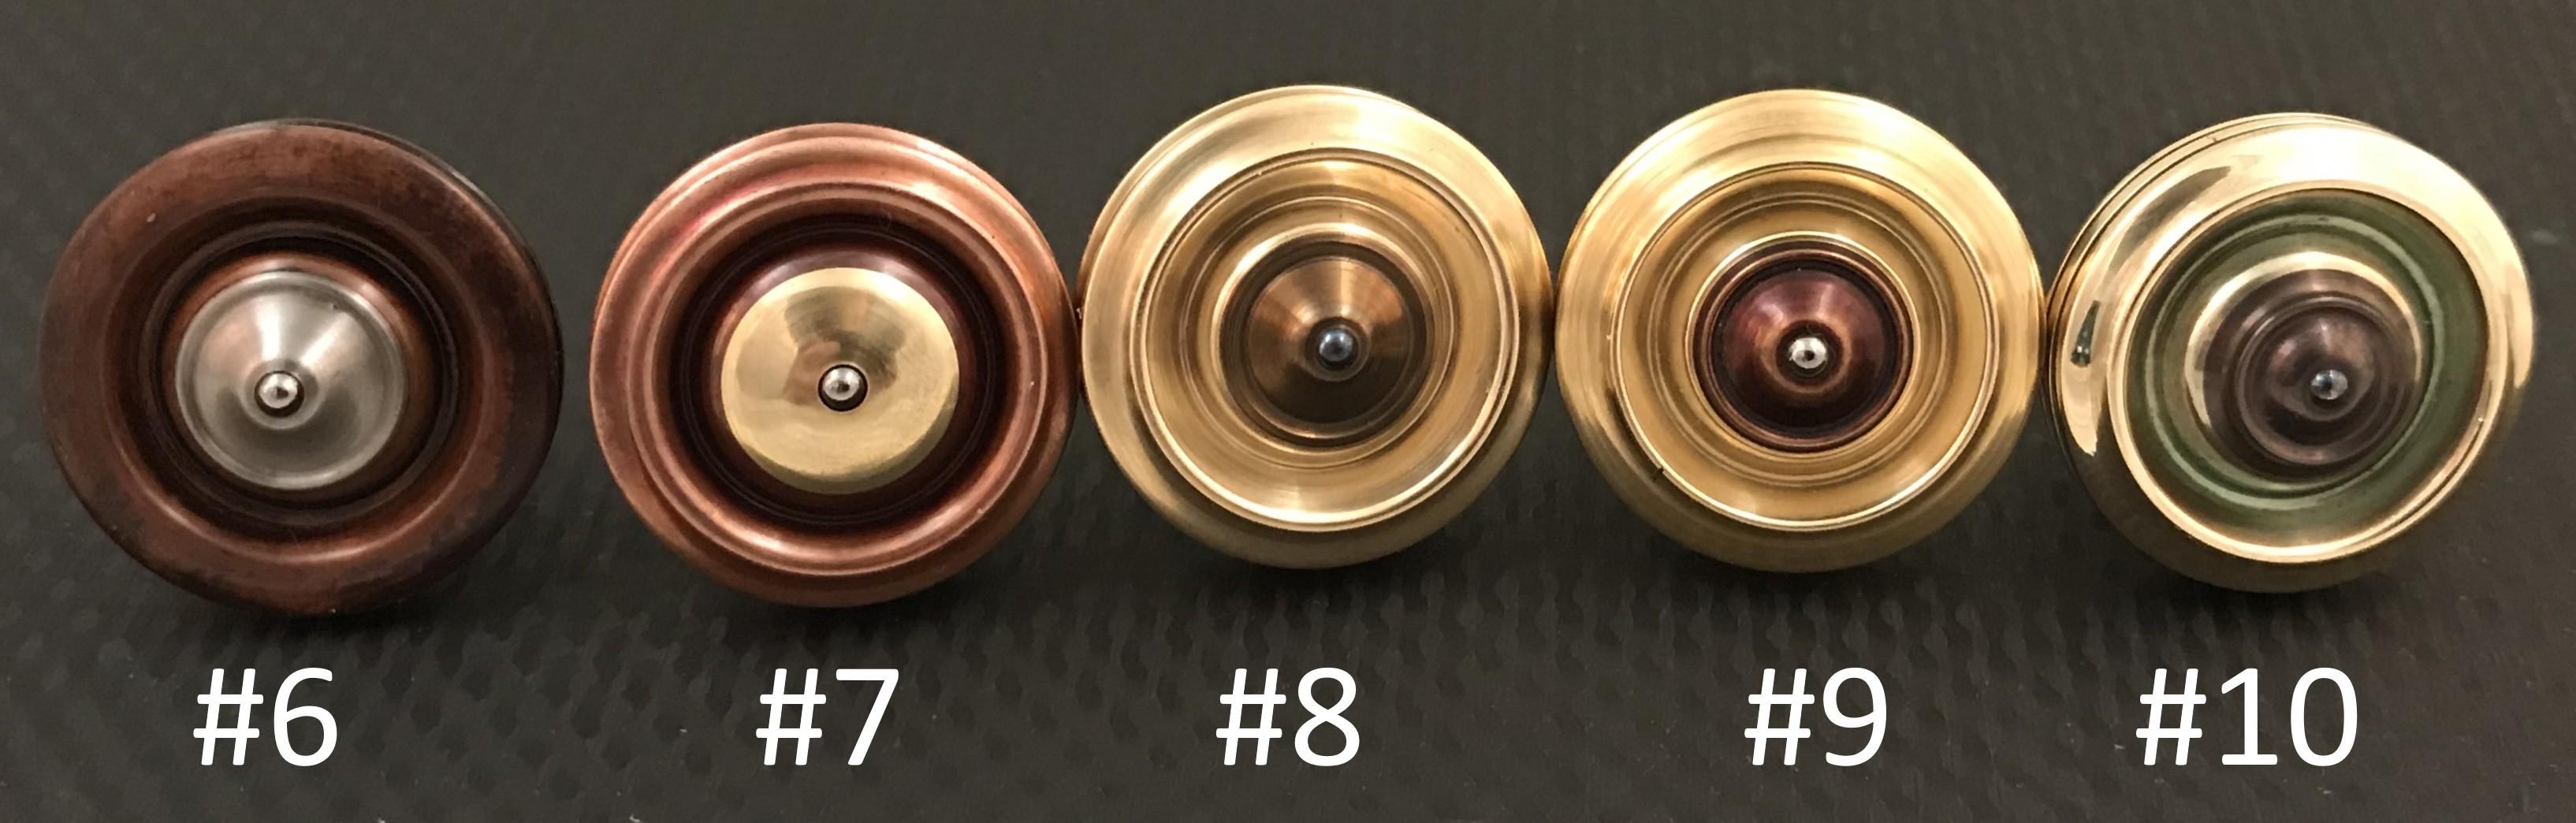 "10 1"" Copper, Brass and Bronze picture 4"